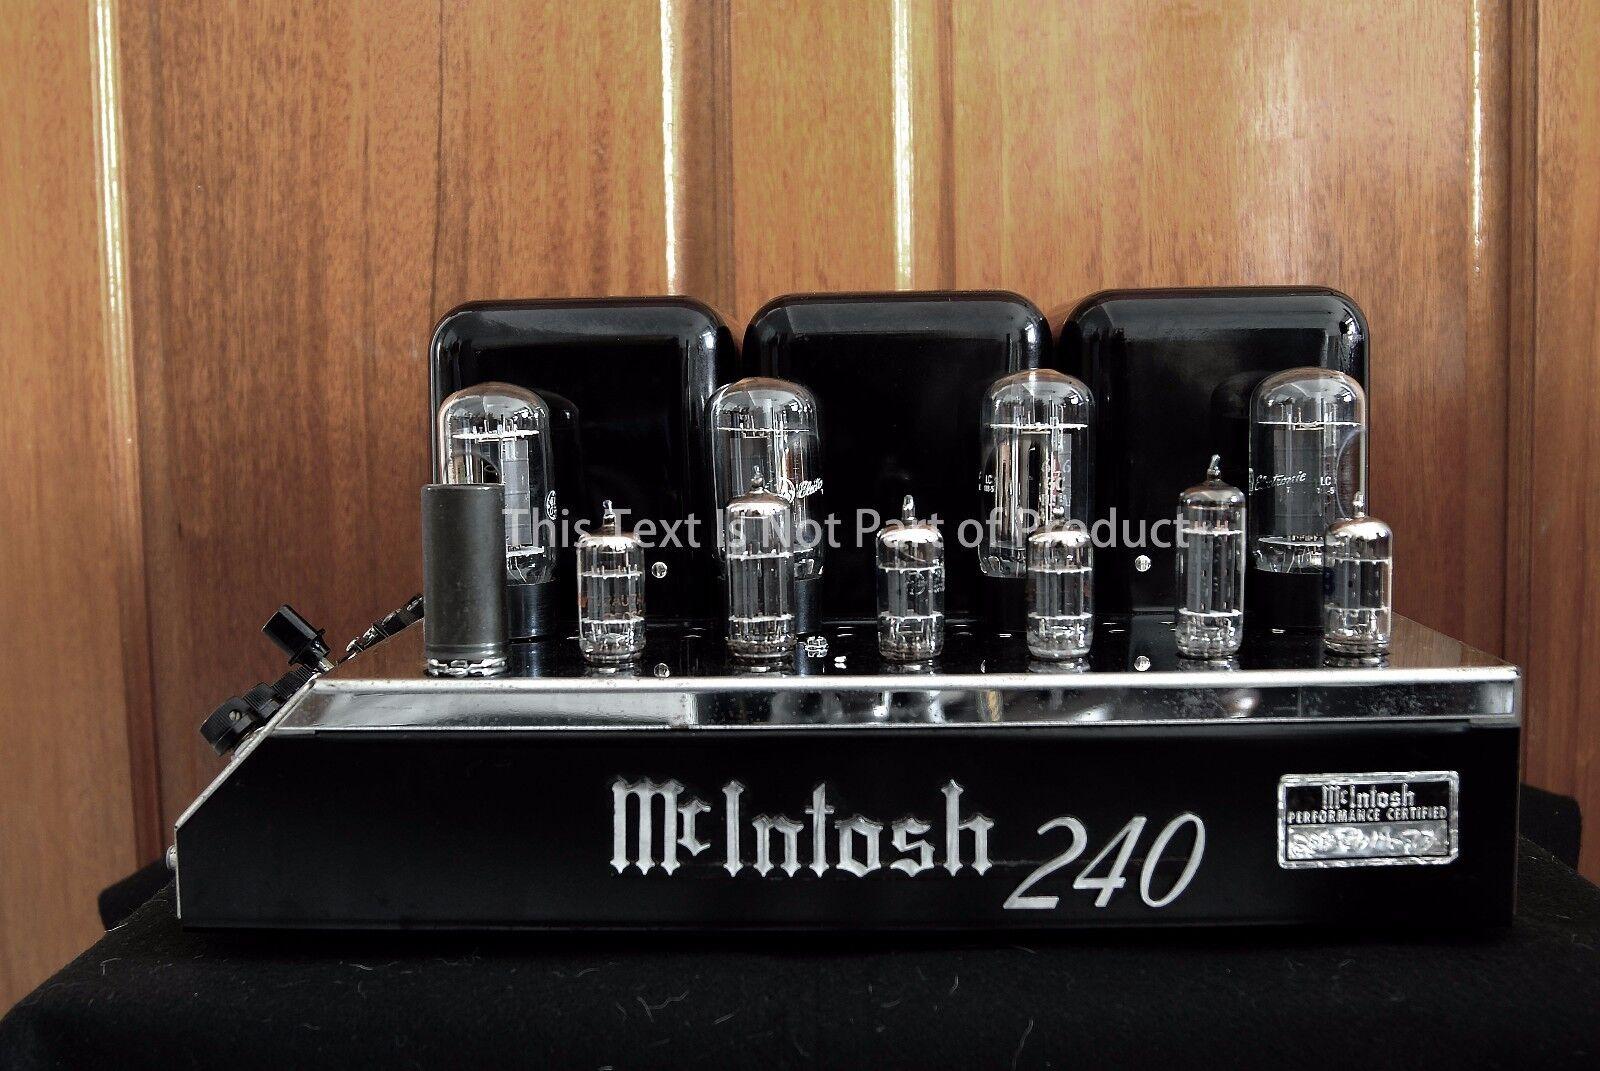 McINTOSH MC30 RHODIUM PLATED LOGO EMBLEM LABEL BADGE New Reproduction for DIY